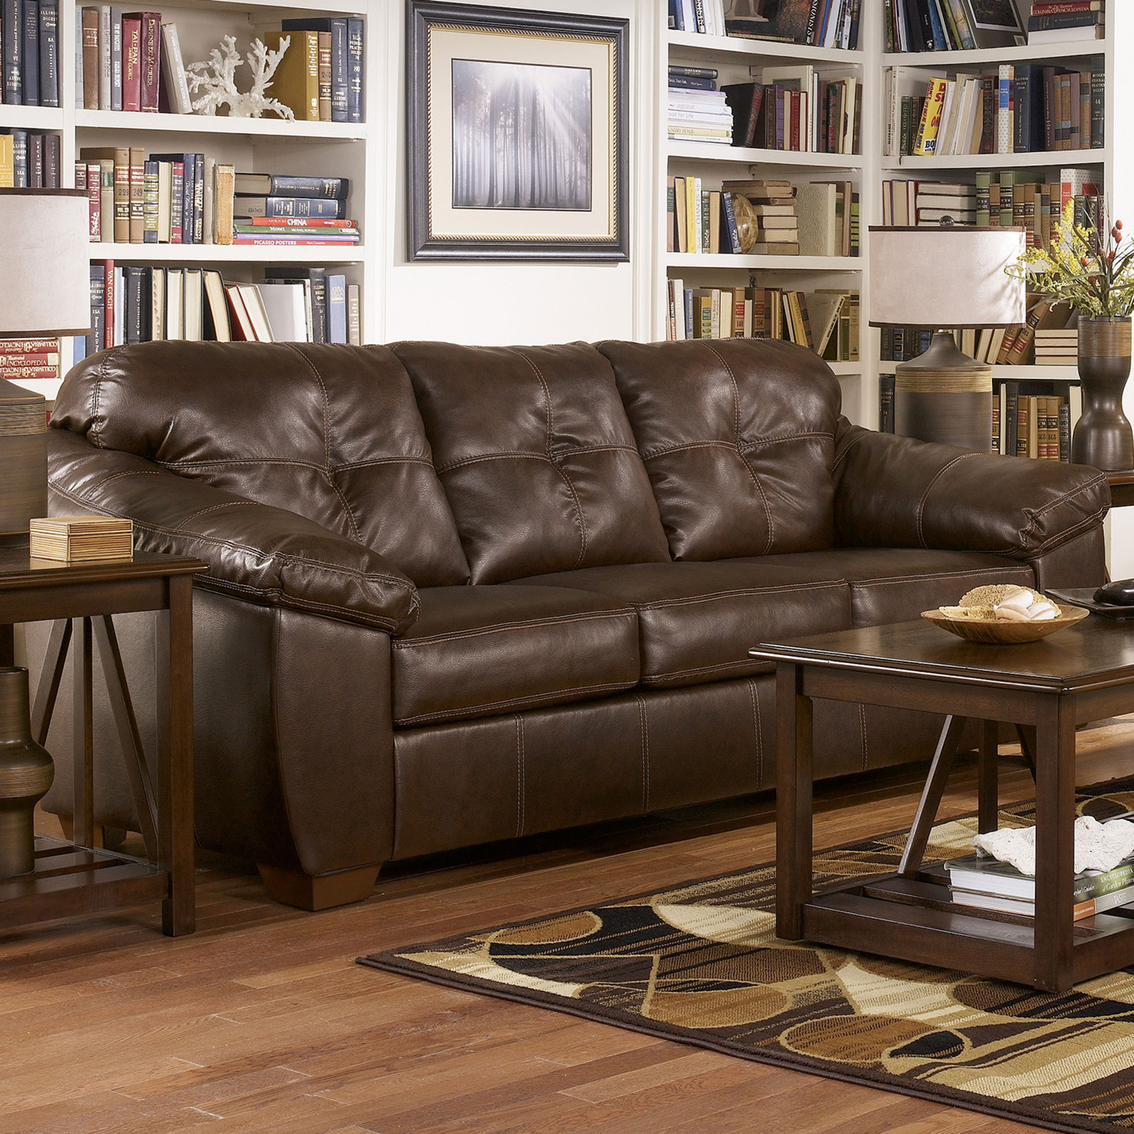 Ashley Furniture San Francisco: Ashley San Lucas Harness Sofa